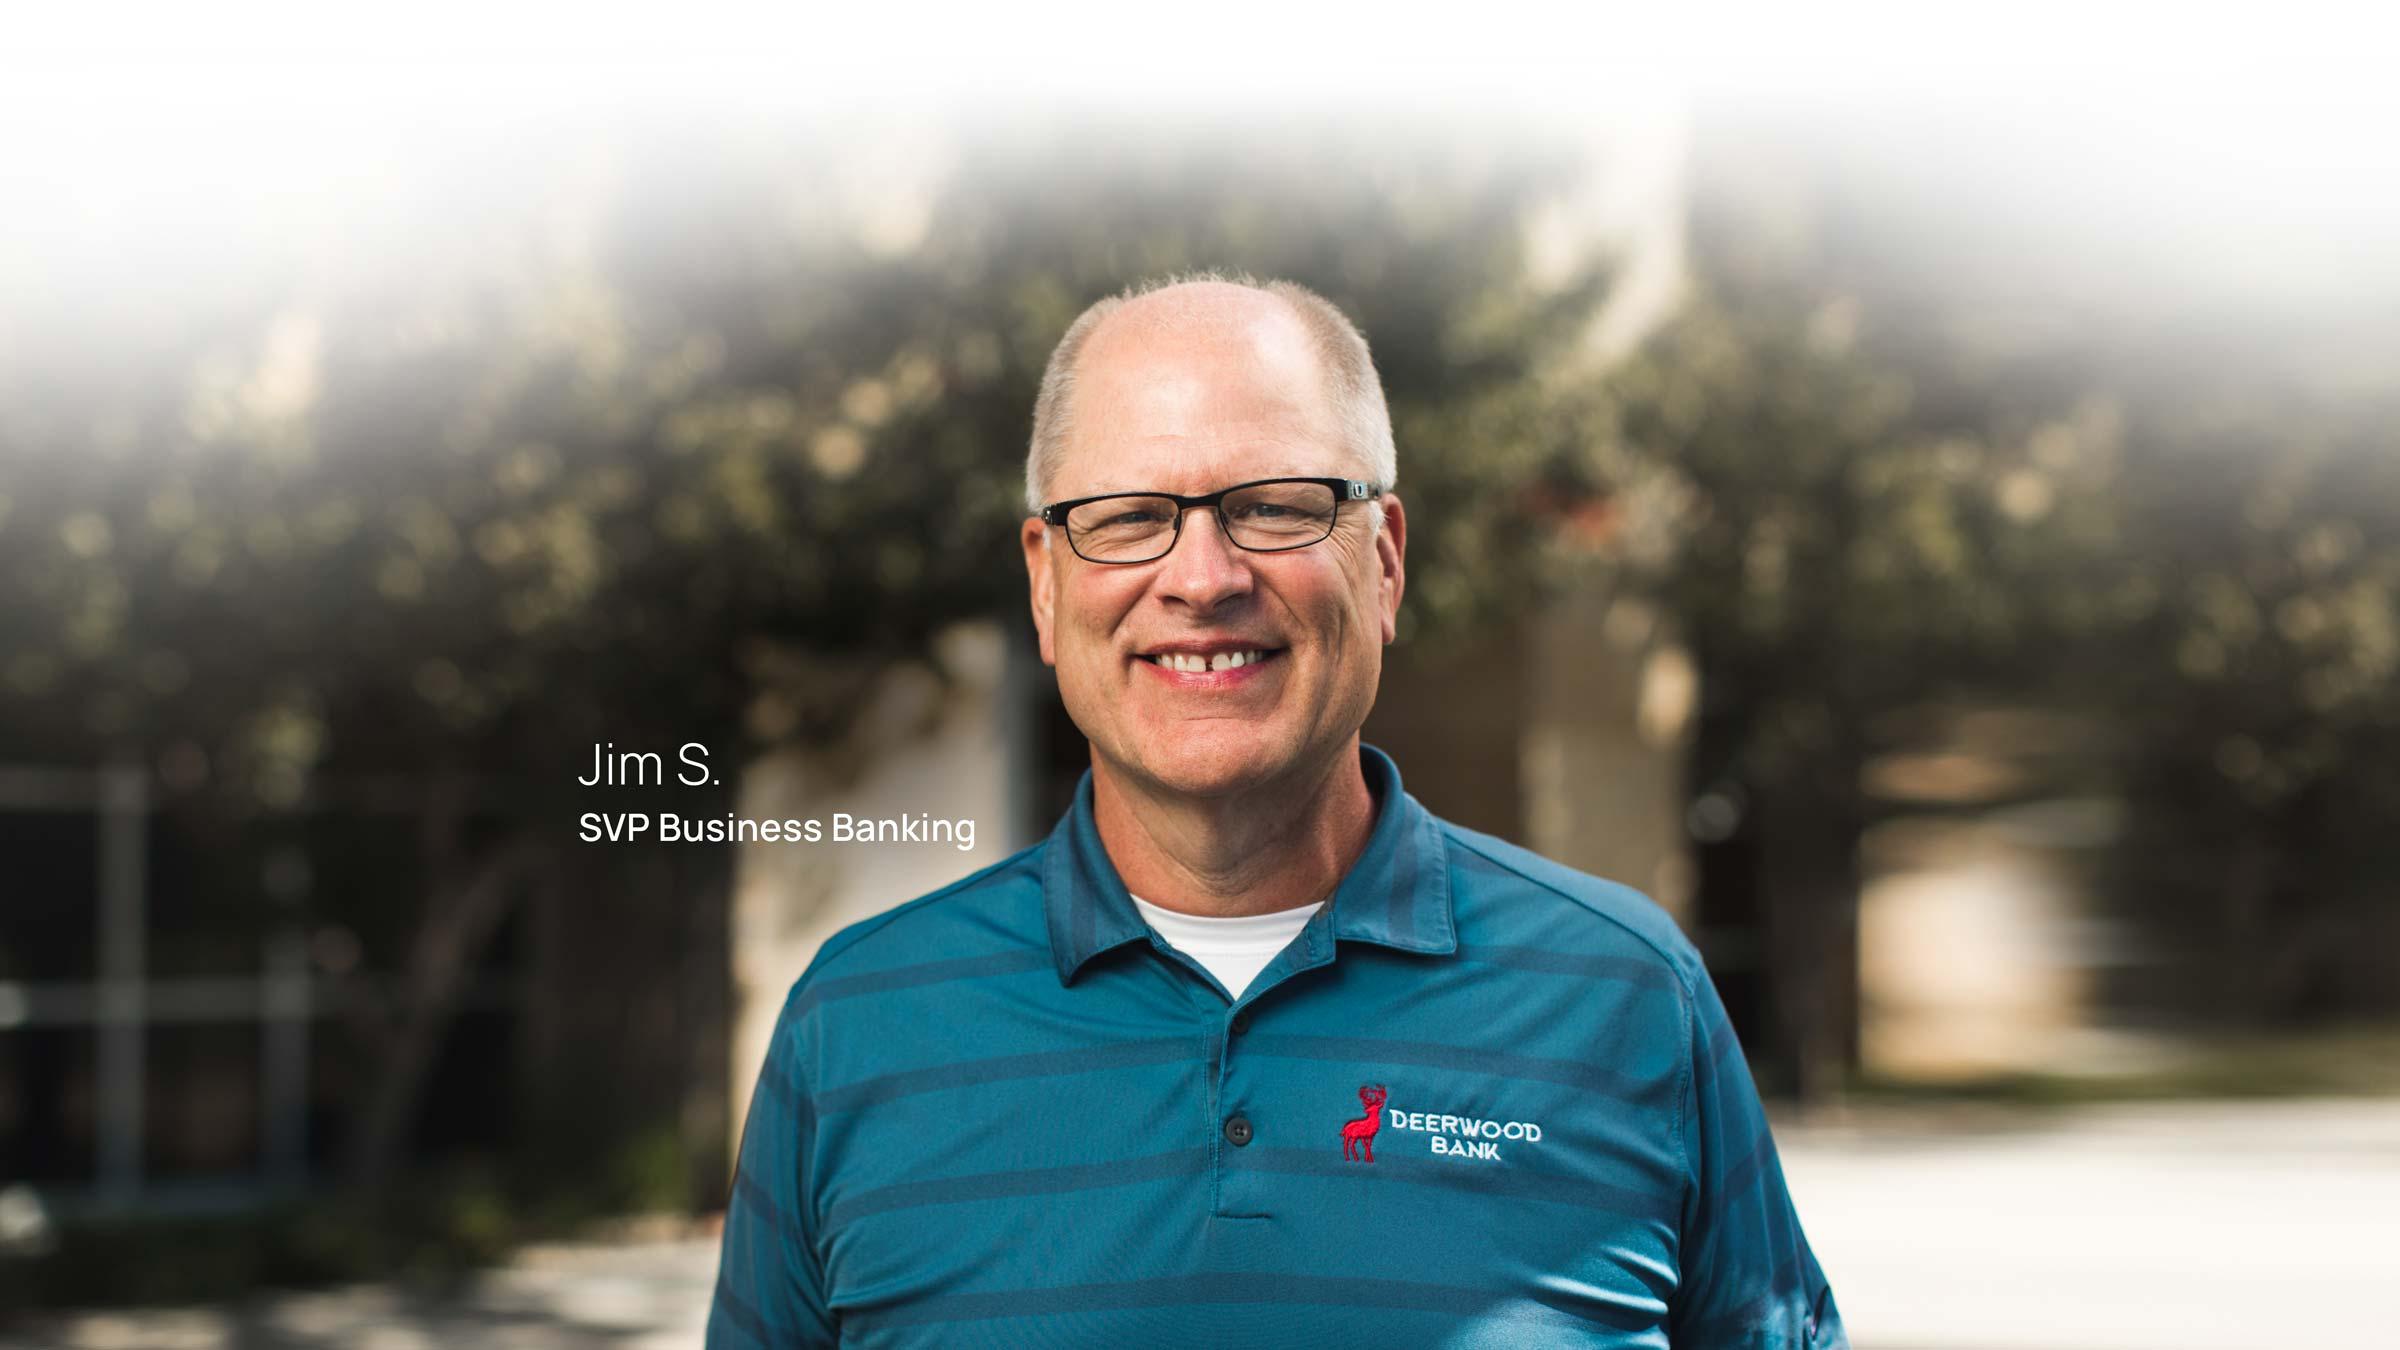 Jim S. SVP Business Banking